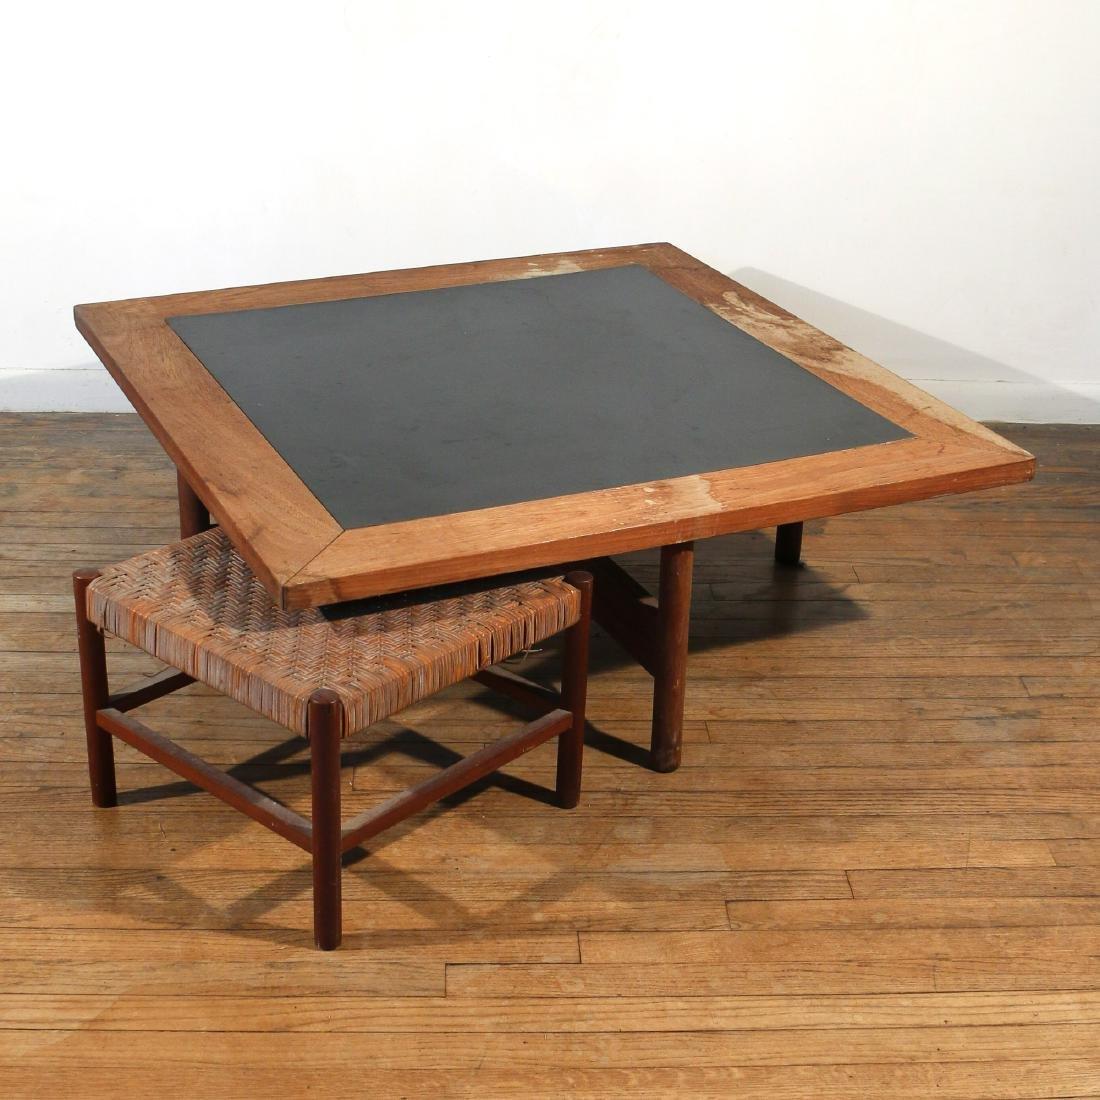 (2pc) AXEL THYGESEN / INTERNA SOFA TABLE & STOOL